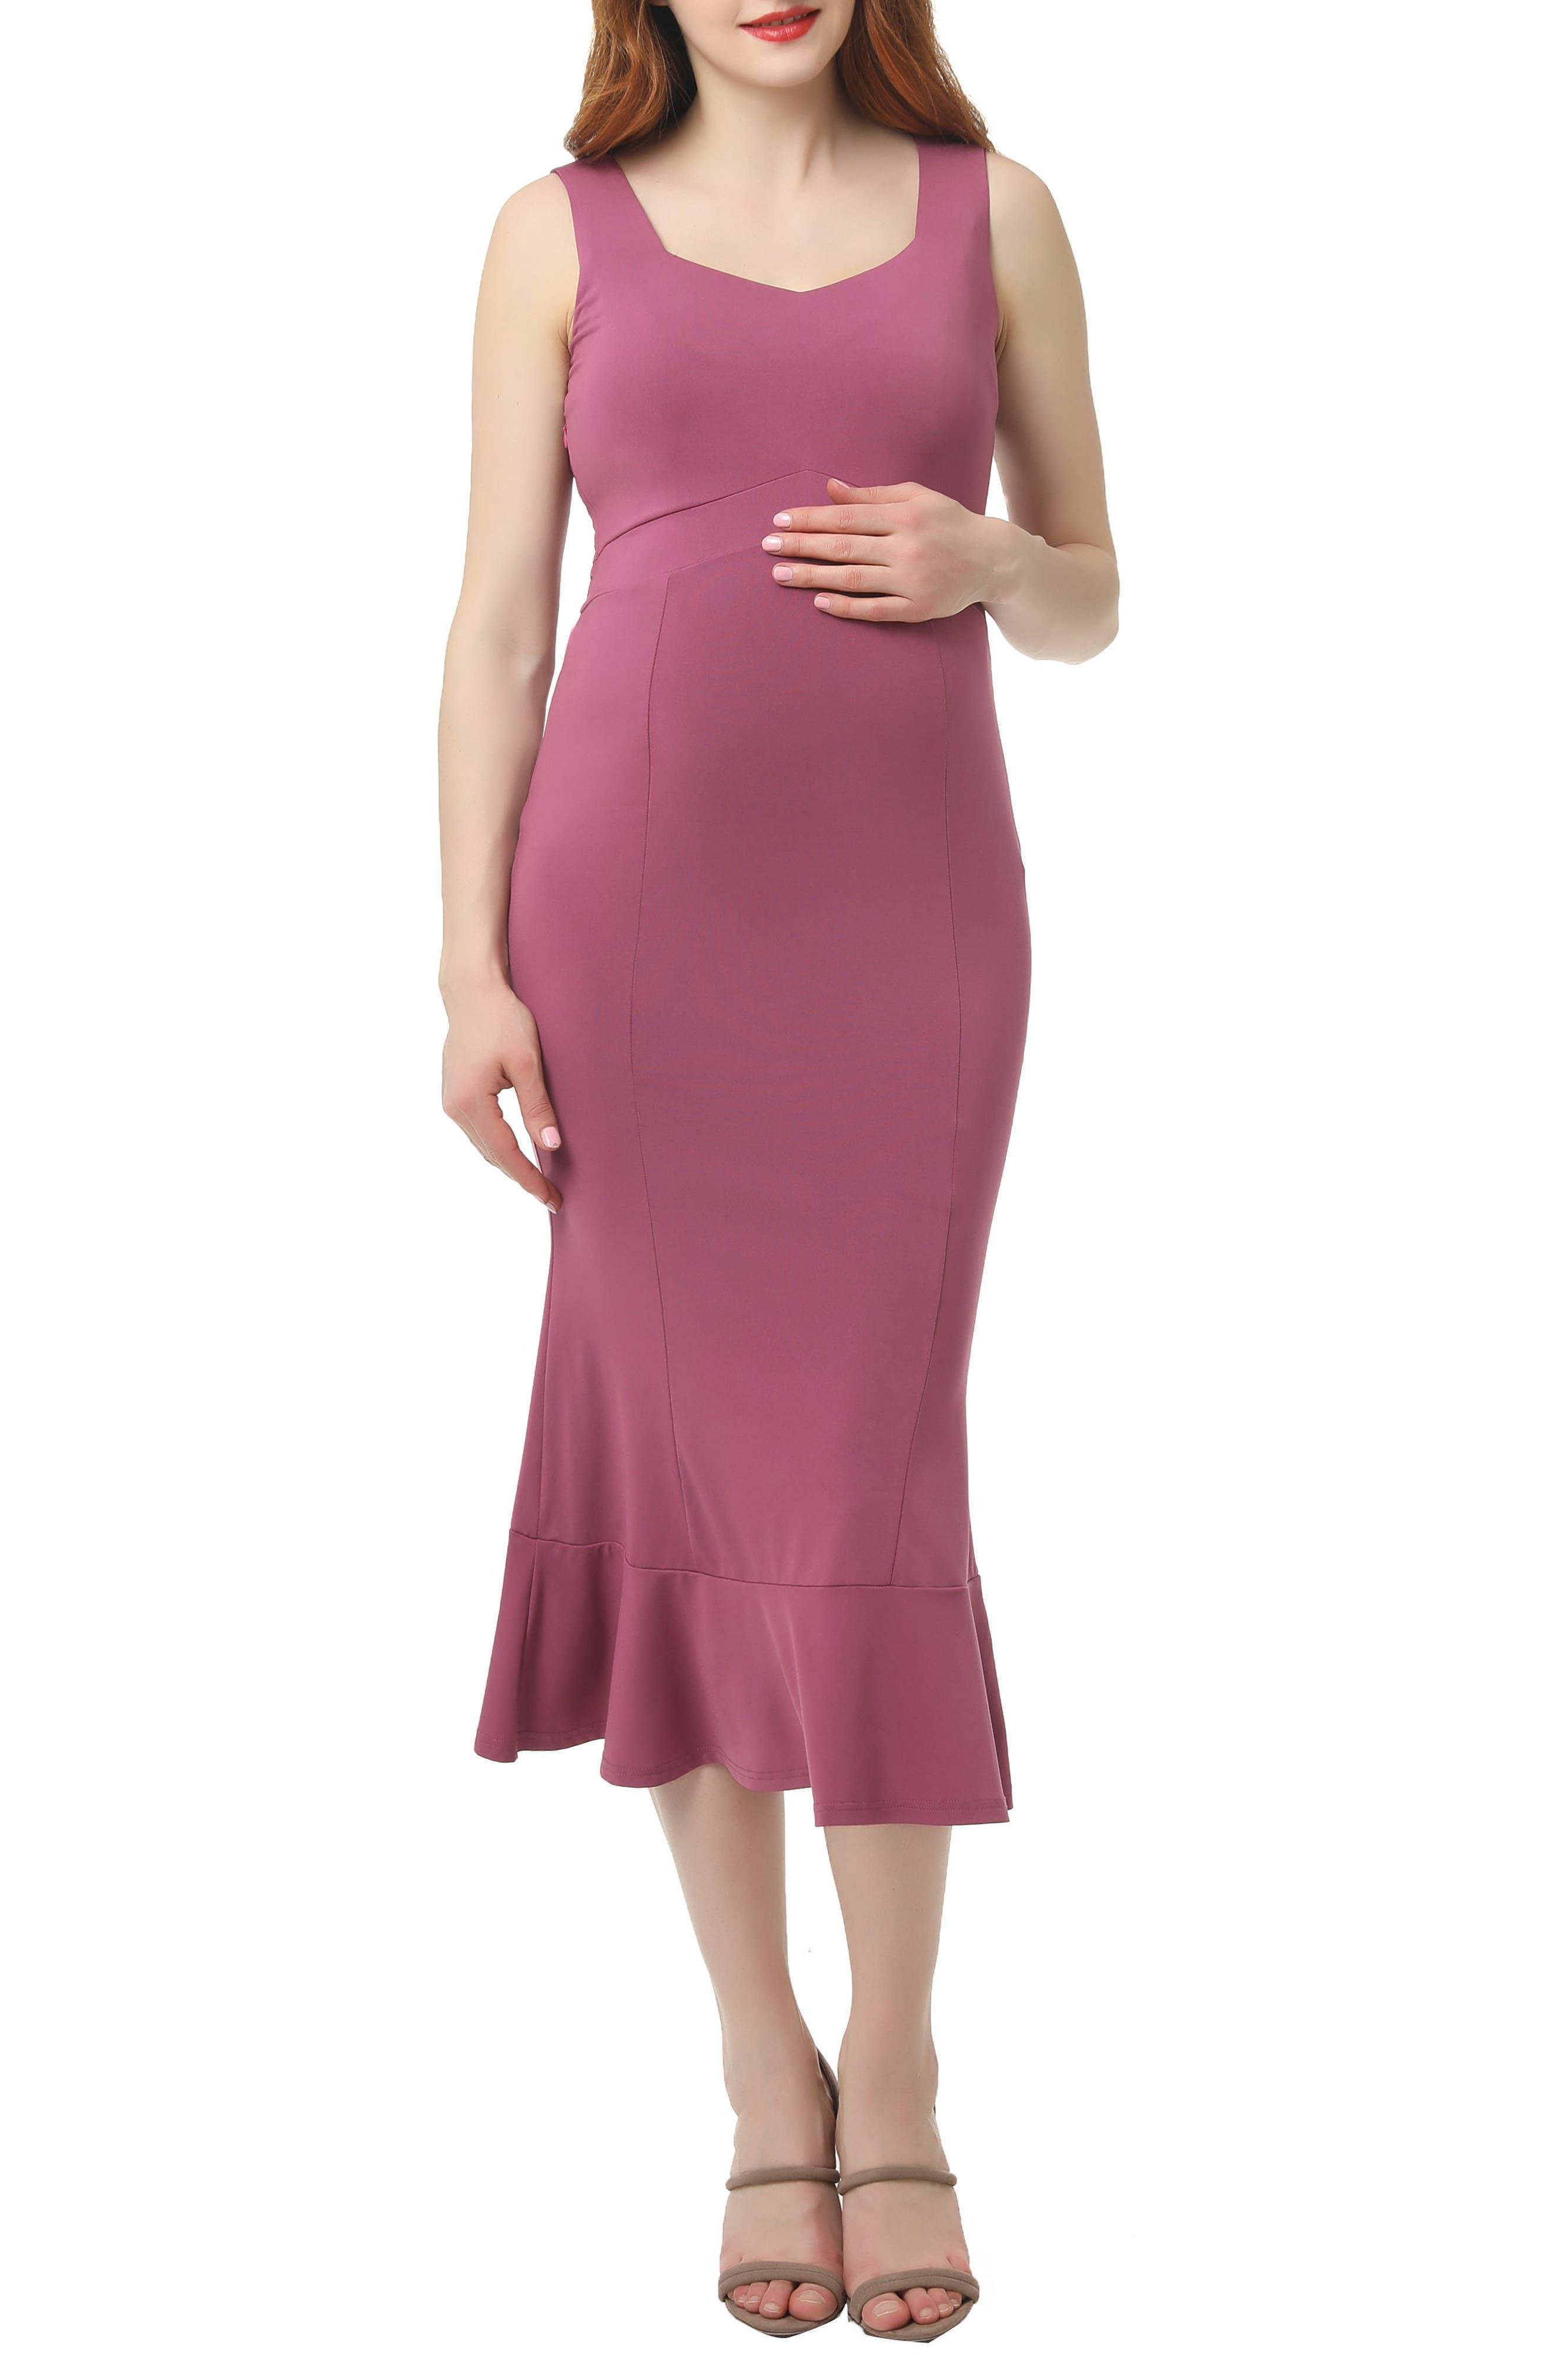 Kimi And Kai Kora Maternity Mermaid Midi Dress, Pink